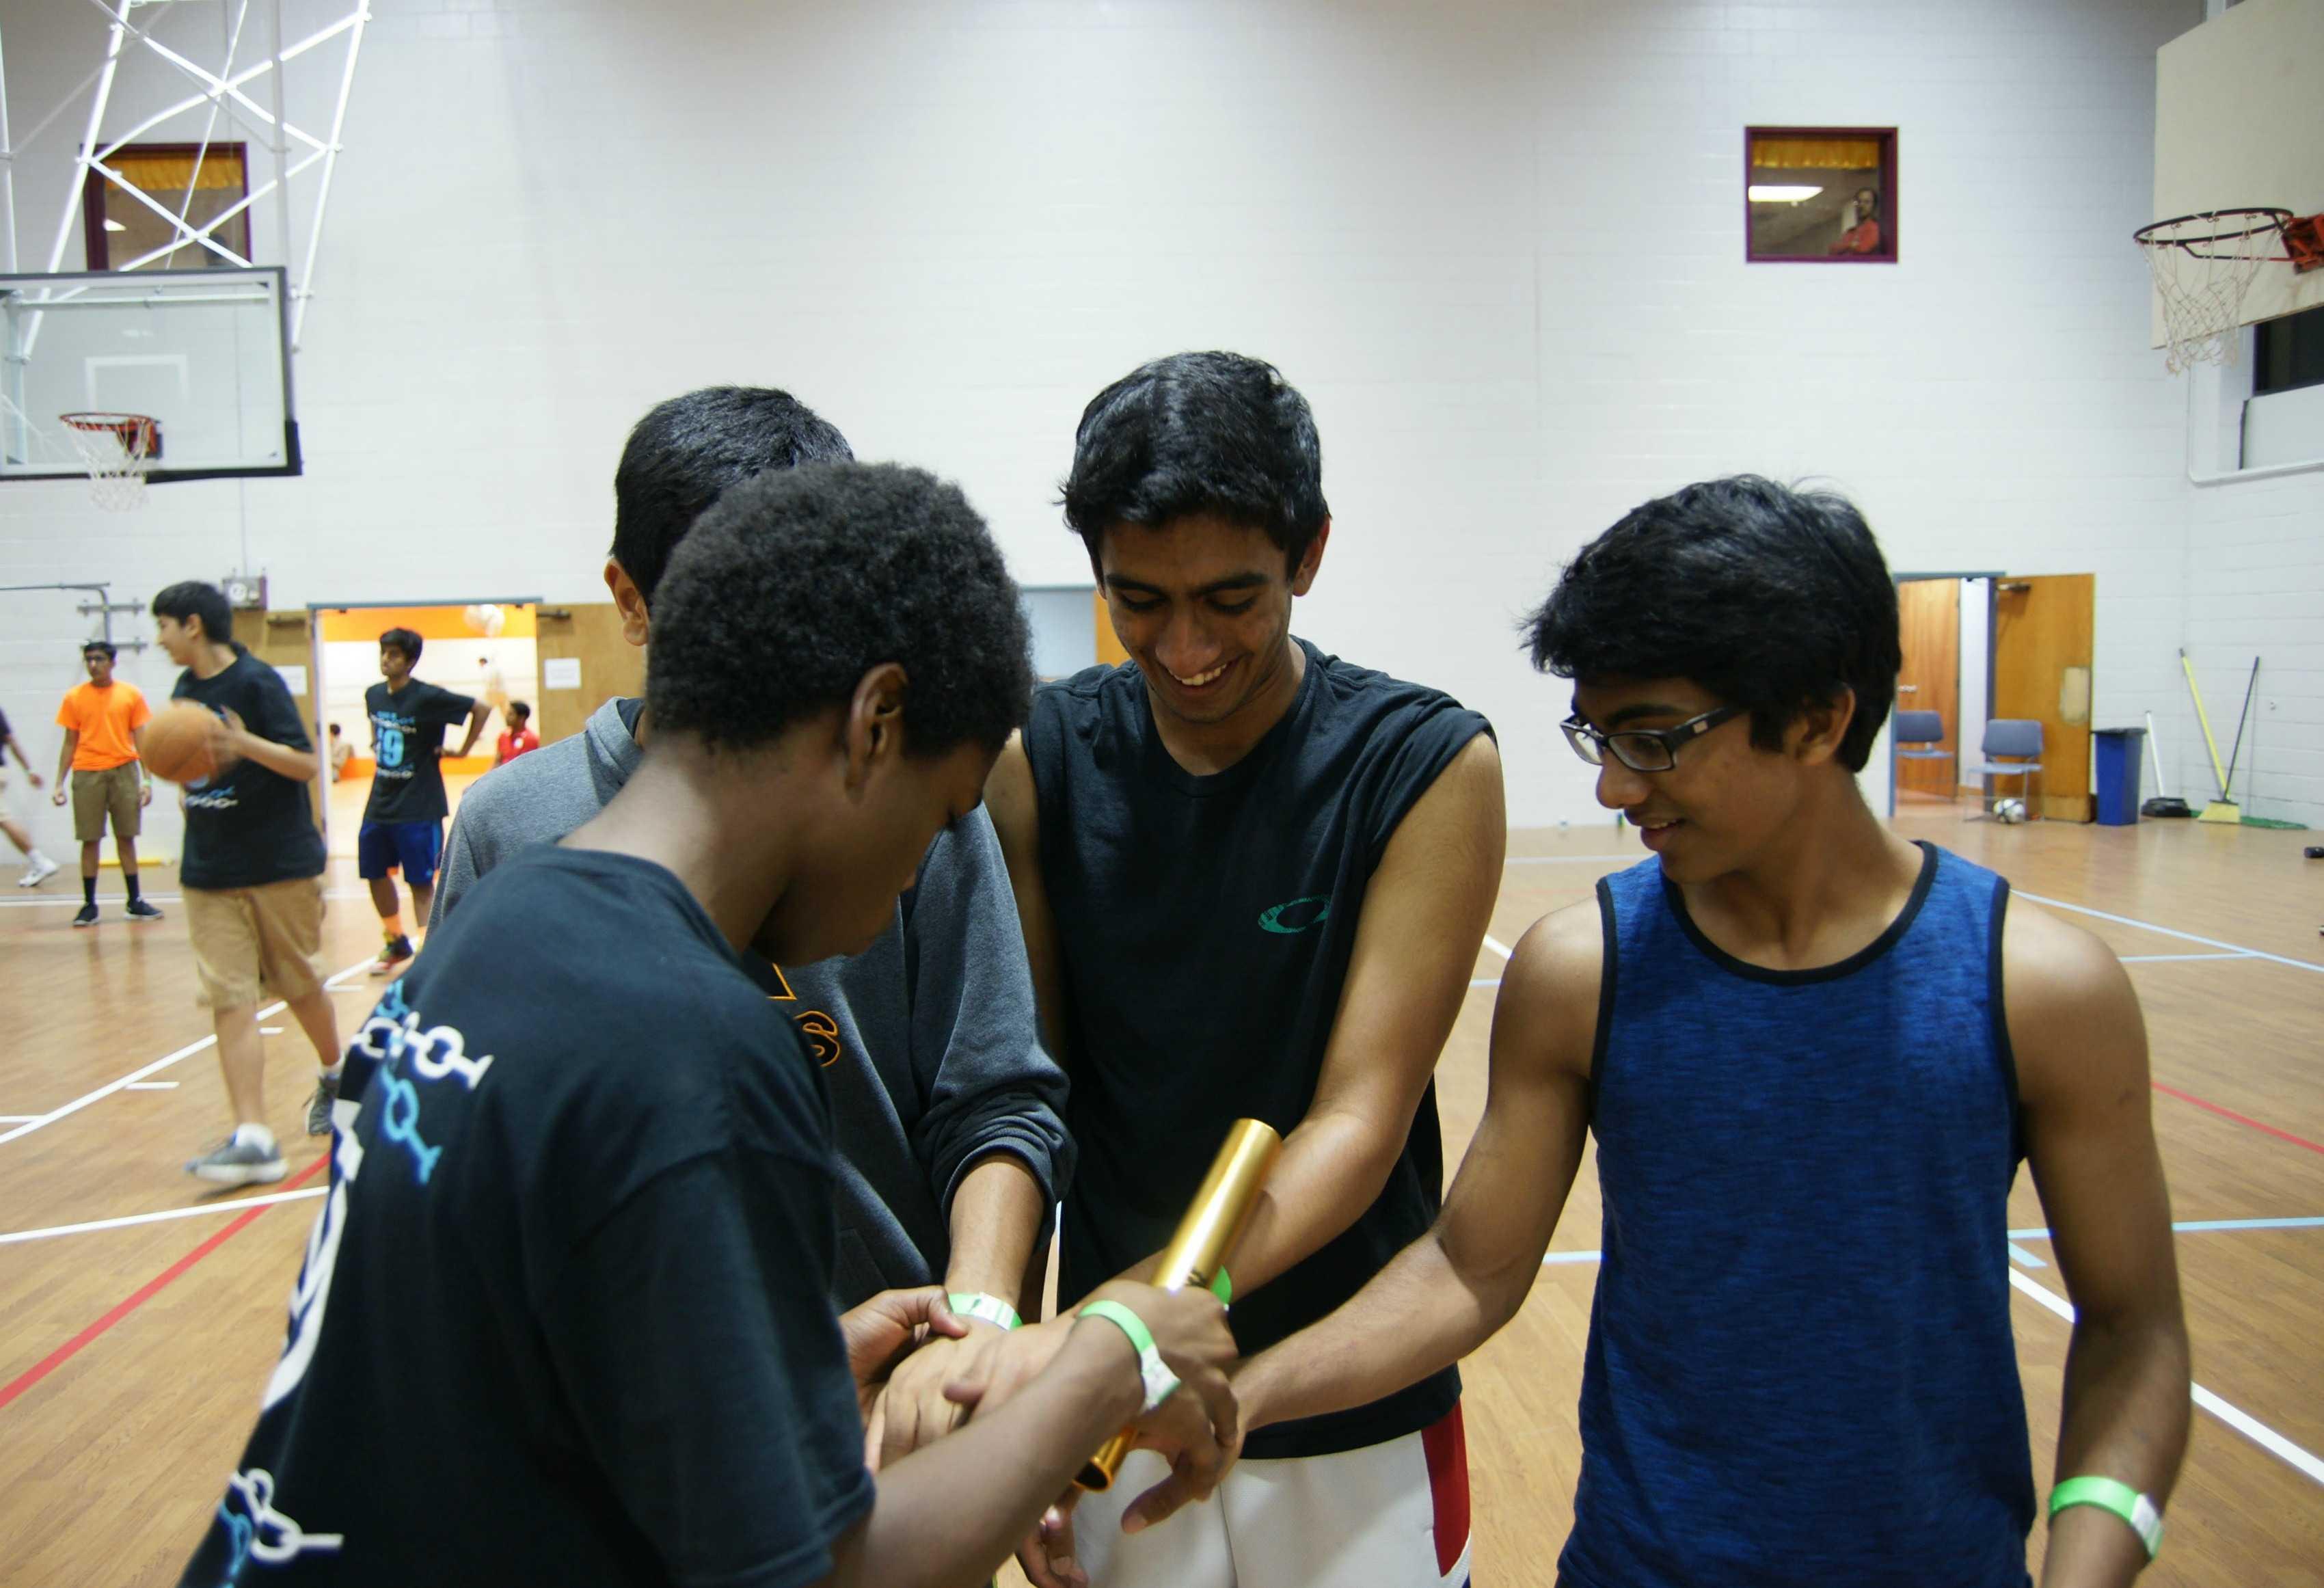 Maxwell+Jones%2C+Aditya+Koneru%2C+and+Nikhil+Bandaru+get+ready+for+the+relay+races.